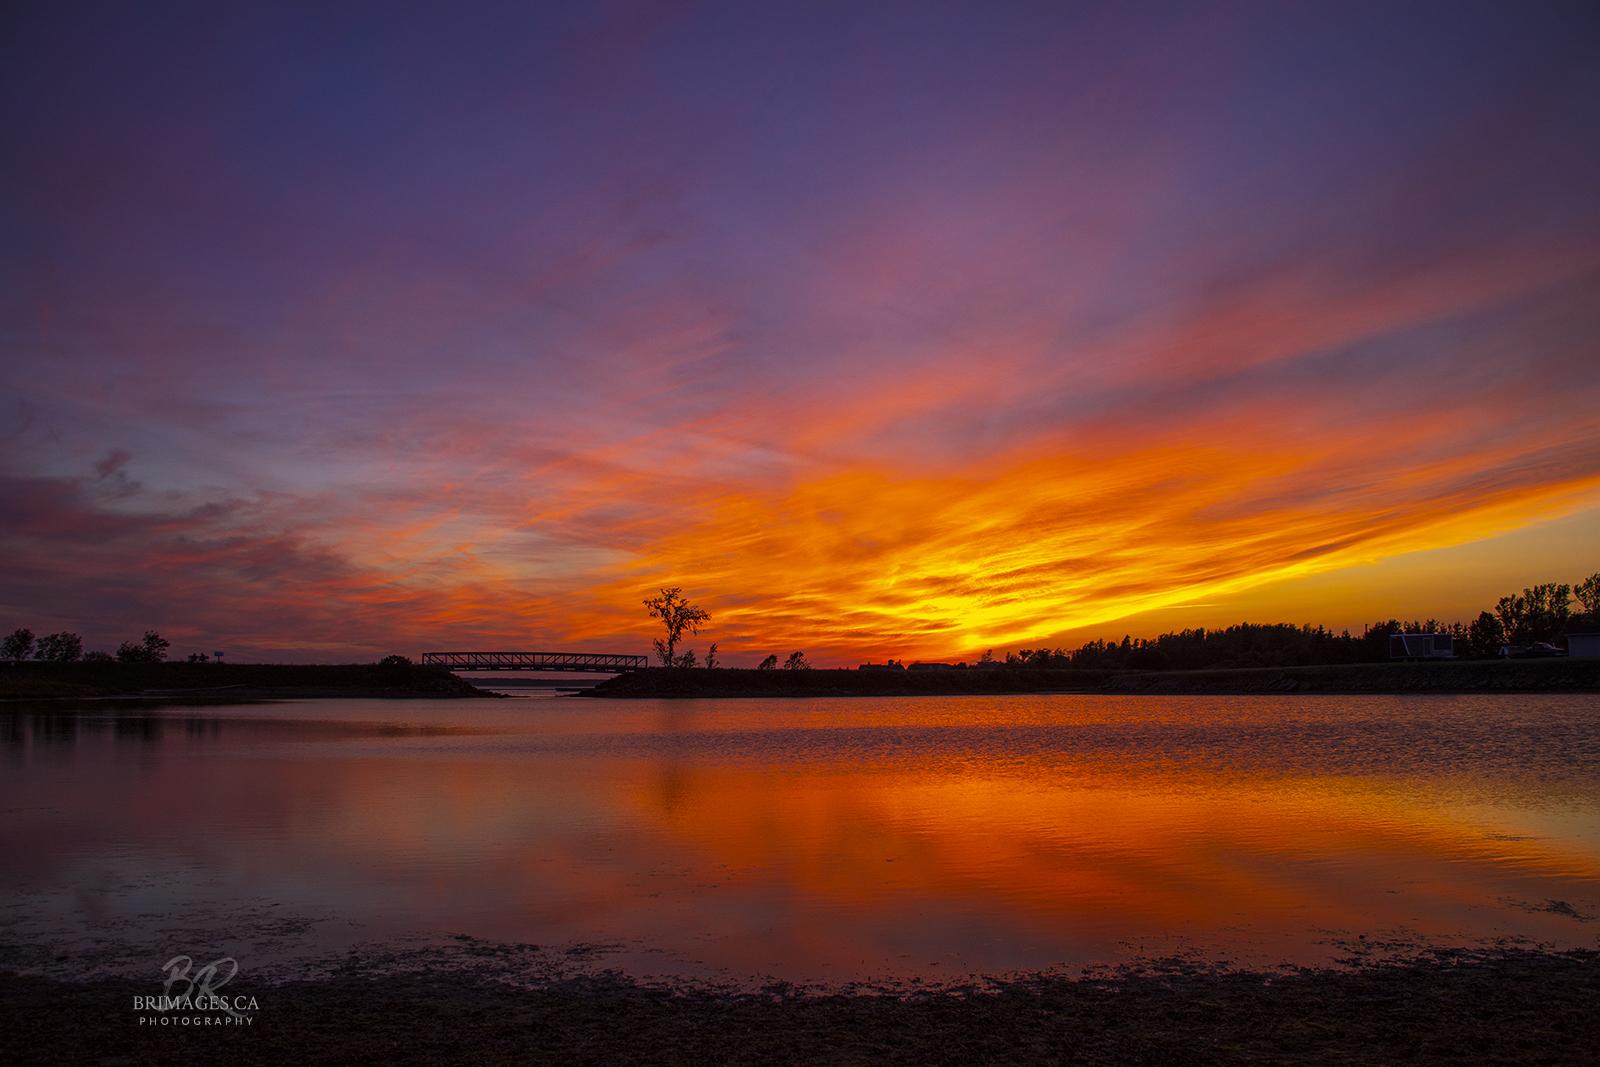 sunset-pointe-du-chene-new-brunswick-canada (5) -BRimages.ca